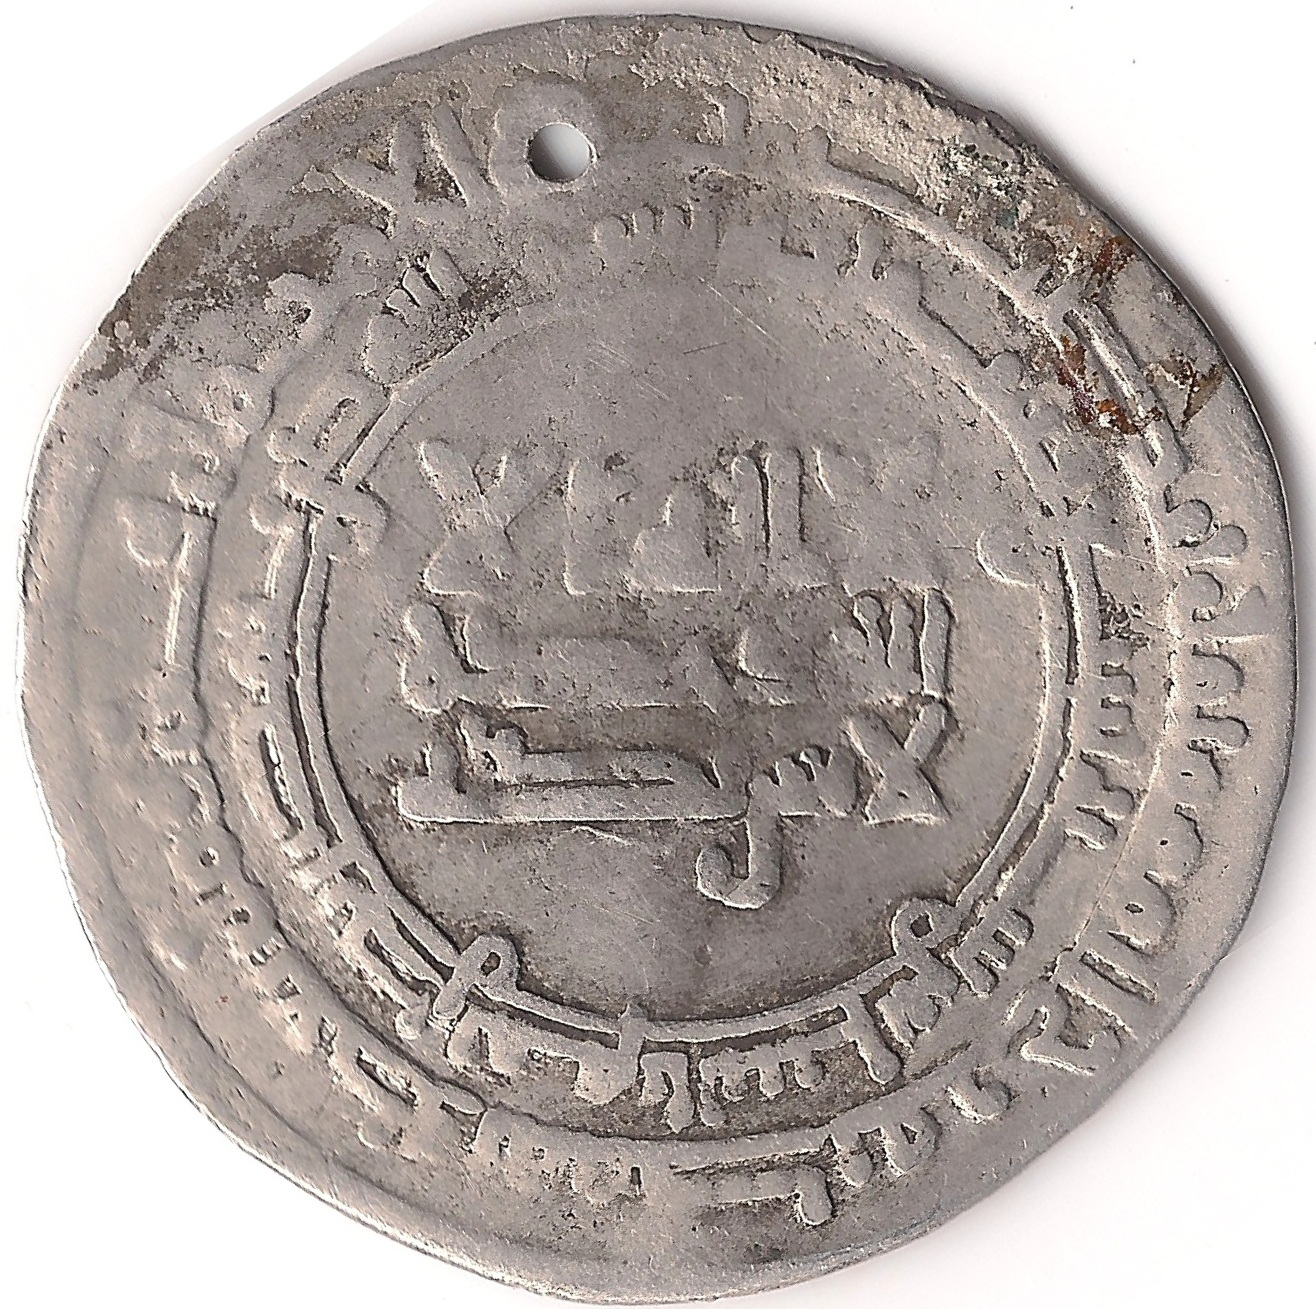 Dirham Samanid de Nasr bin Ahmed (913-42 AD) ceca al-Shash Side+b